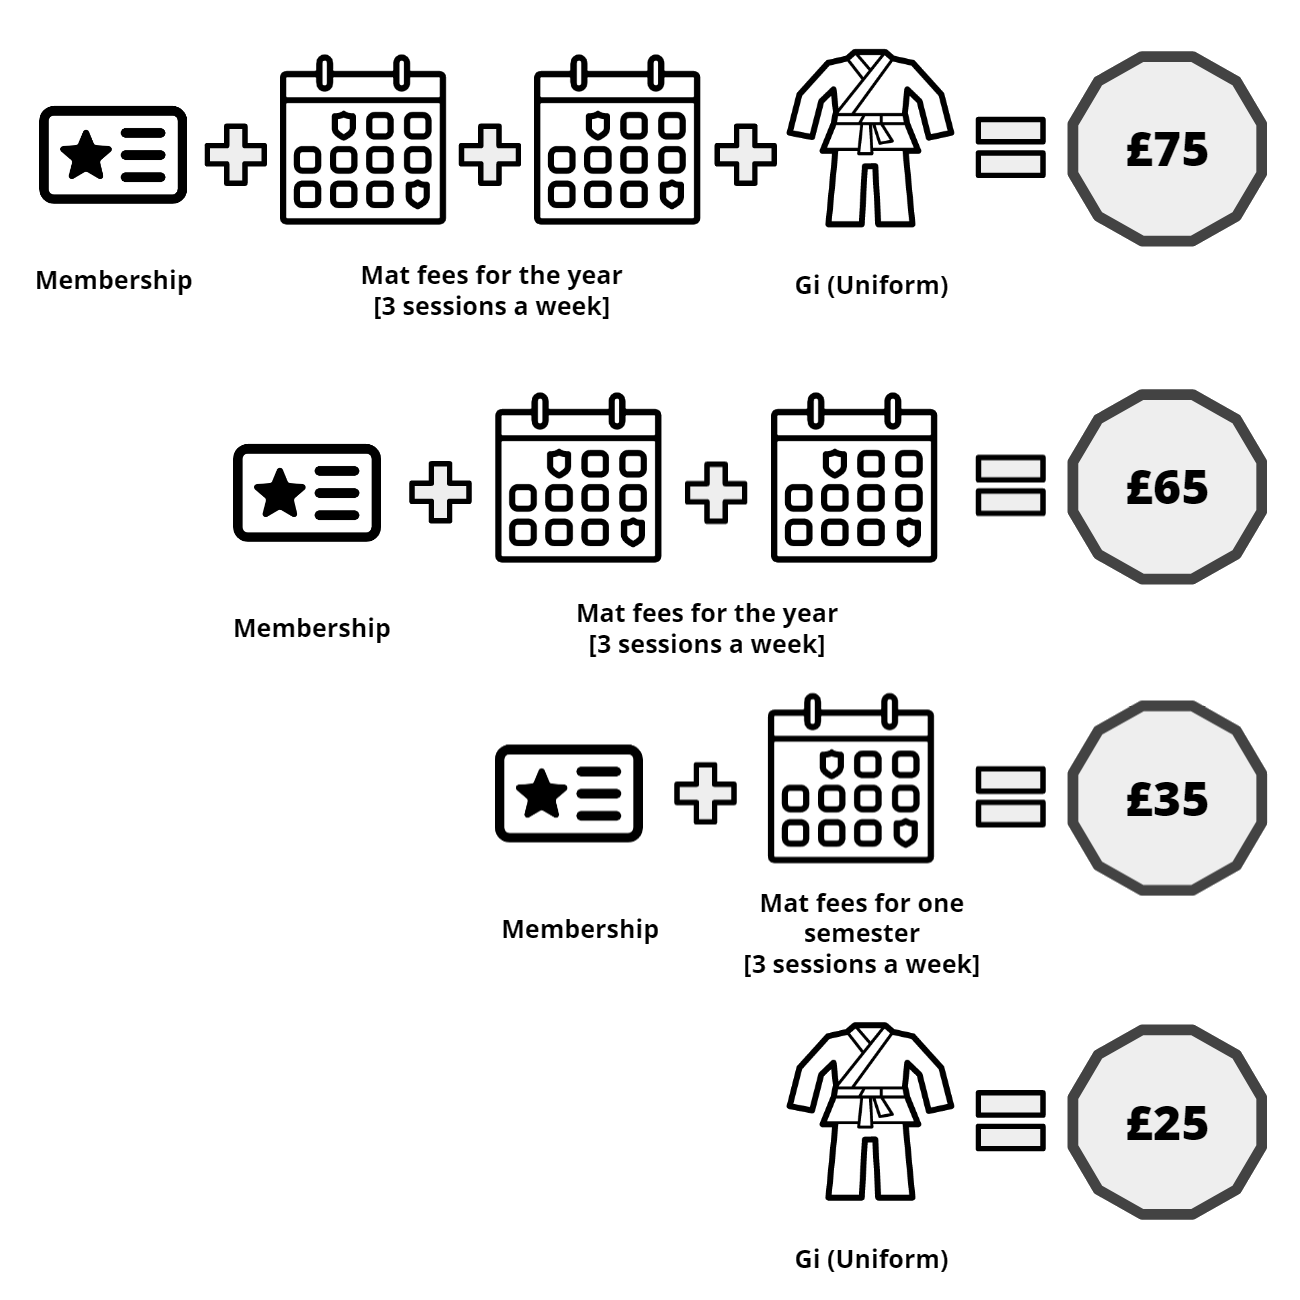 Club costs